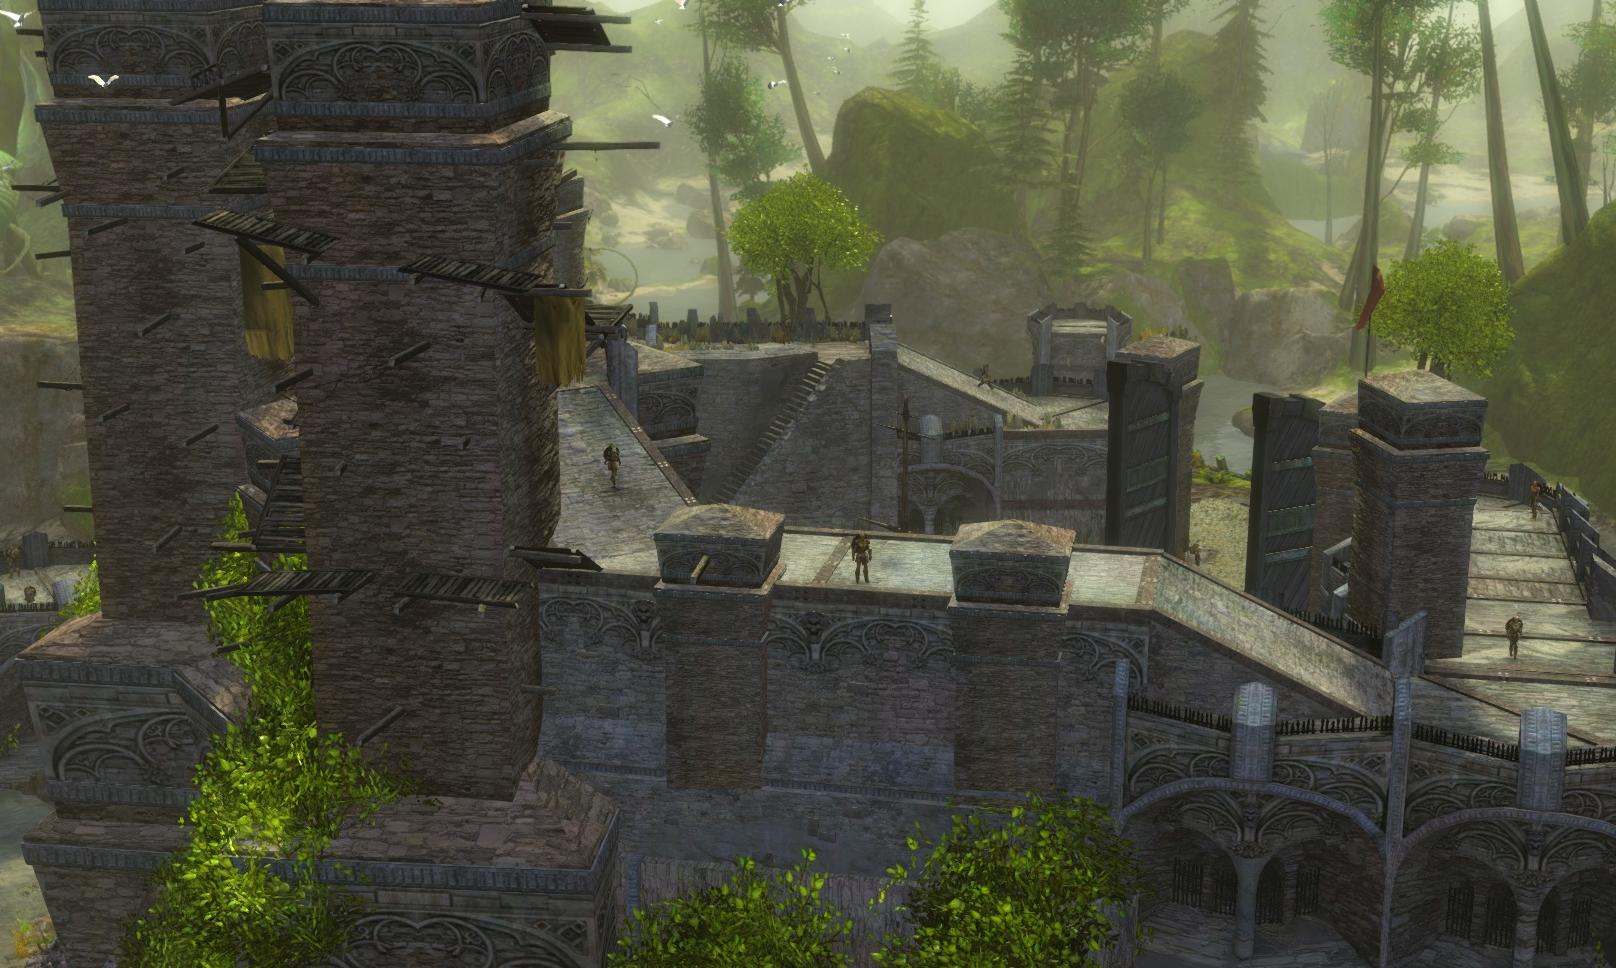 Guild Wars 2 - Vistas in Caledon Forest - 02 Queztal Bay